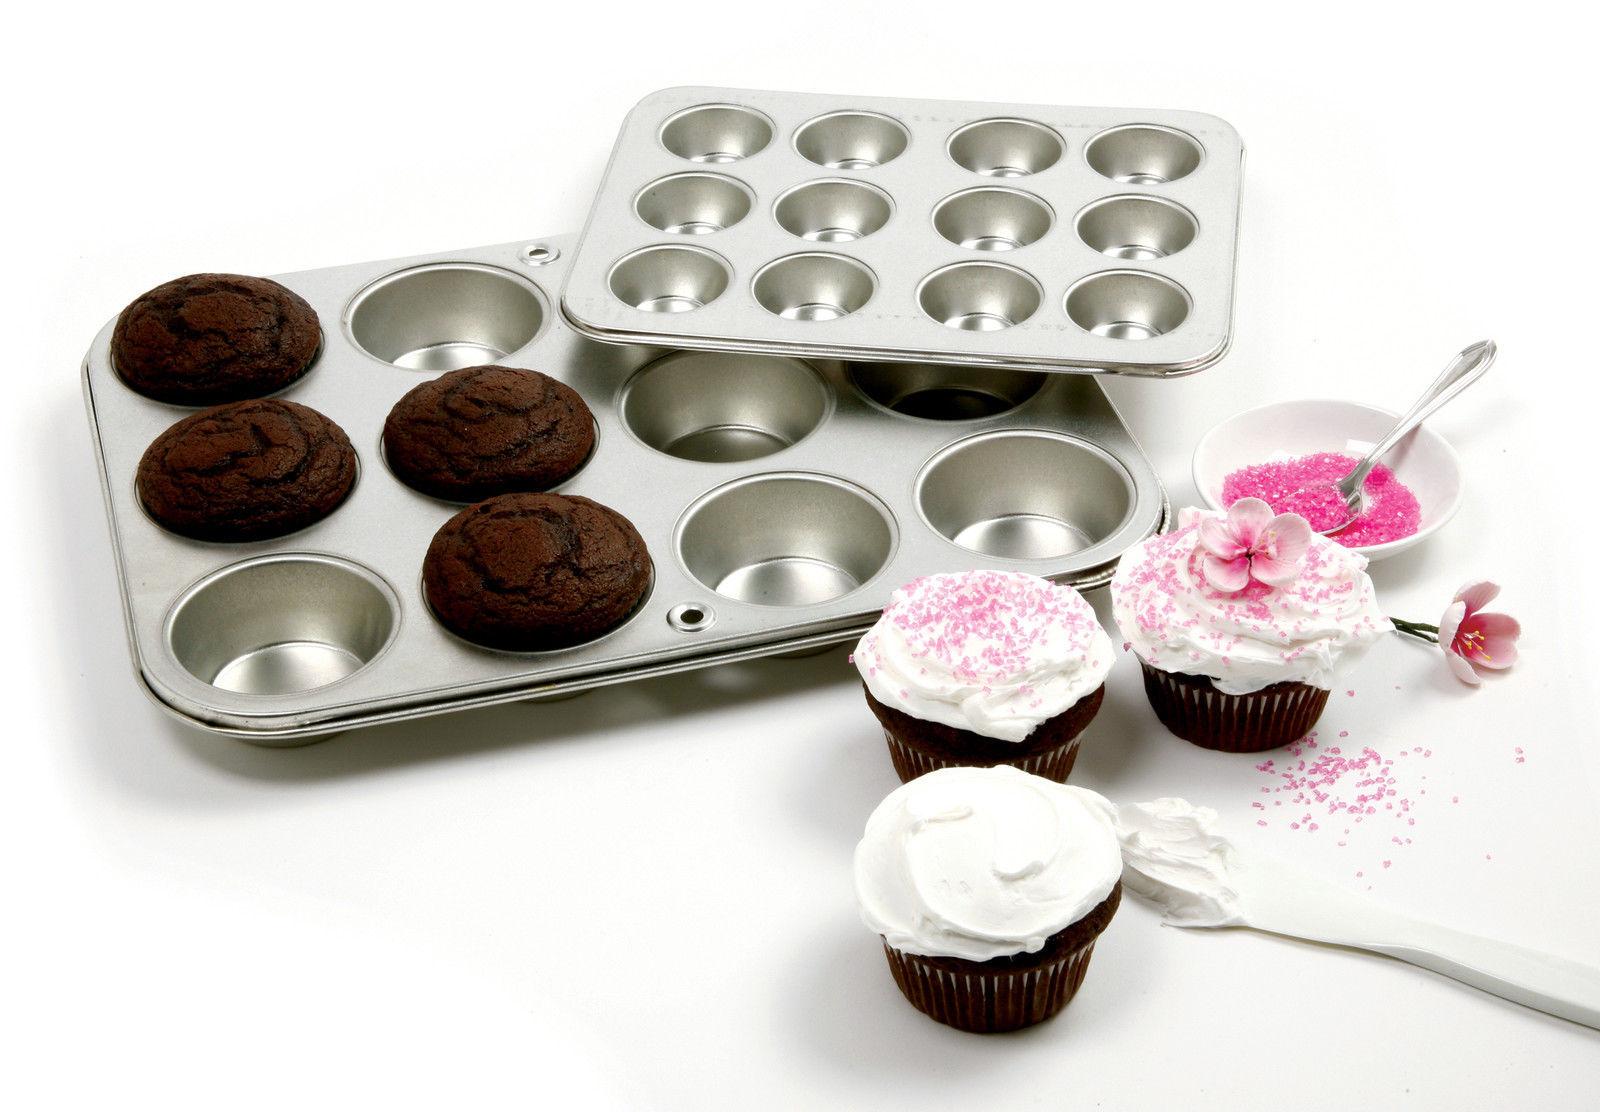 NORPRO 3770 Heavy-Duty Gauge Tin Muffin Cupcake Pan 12 Cup